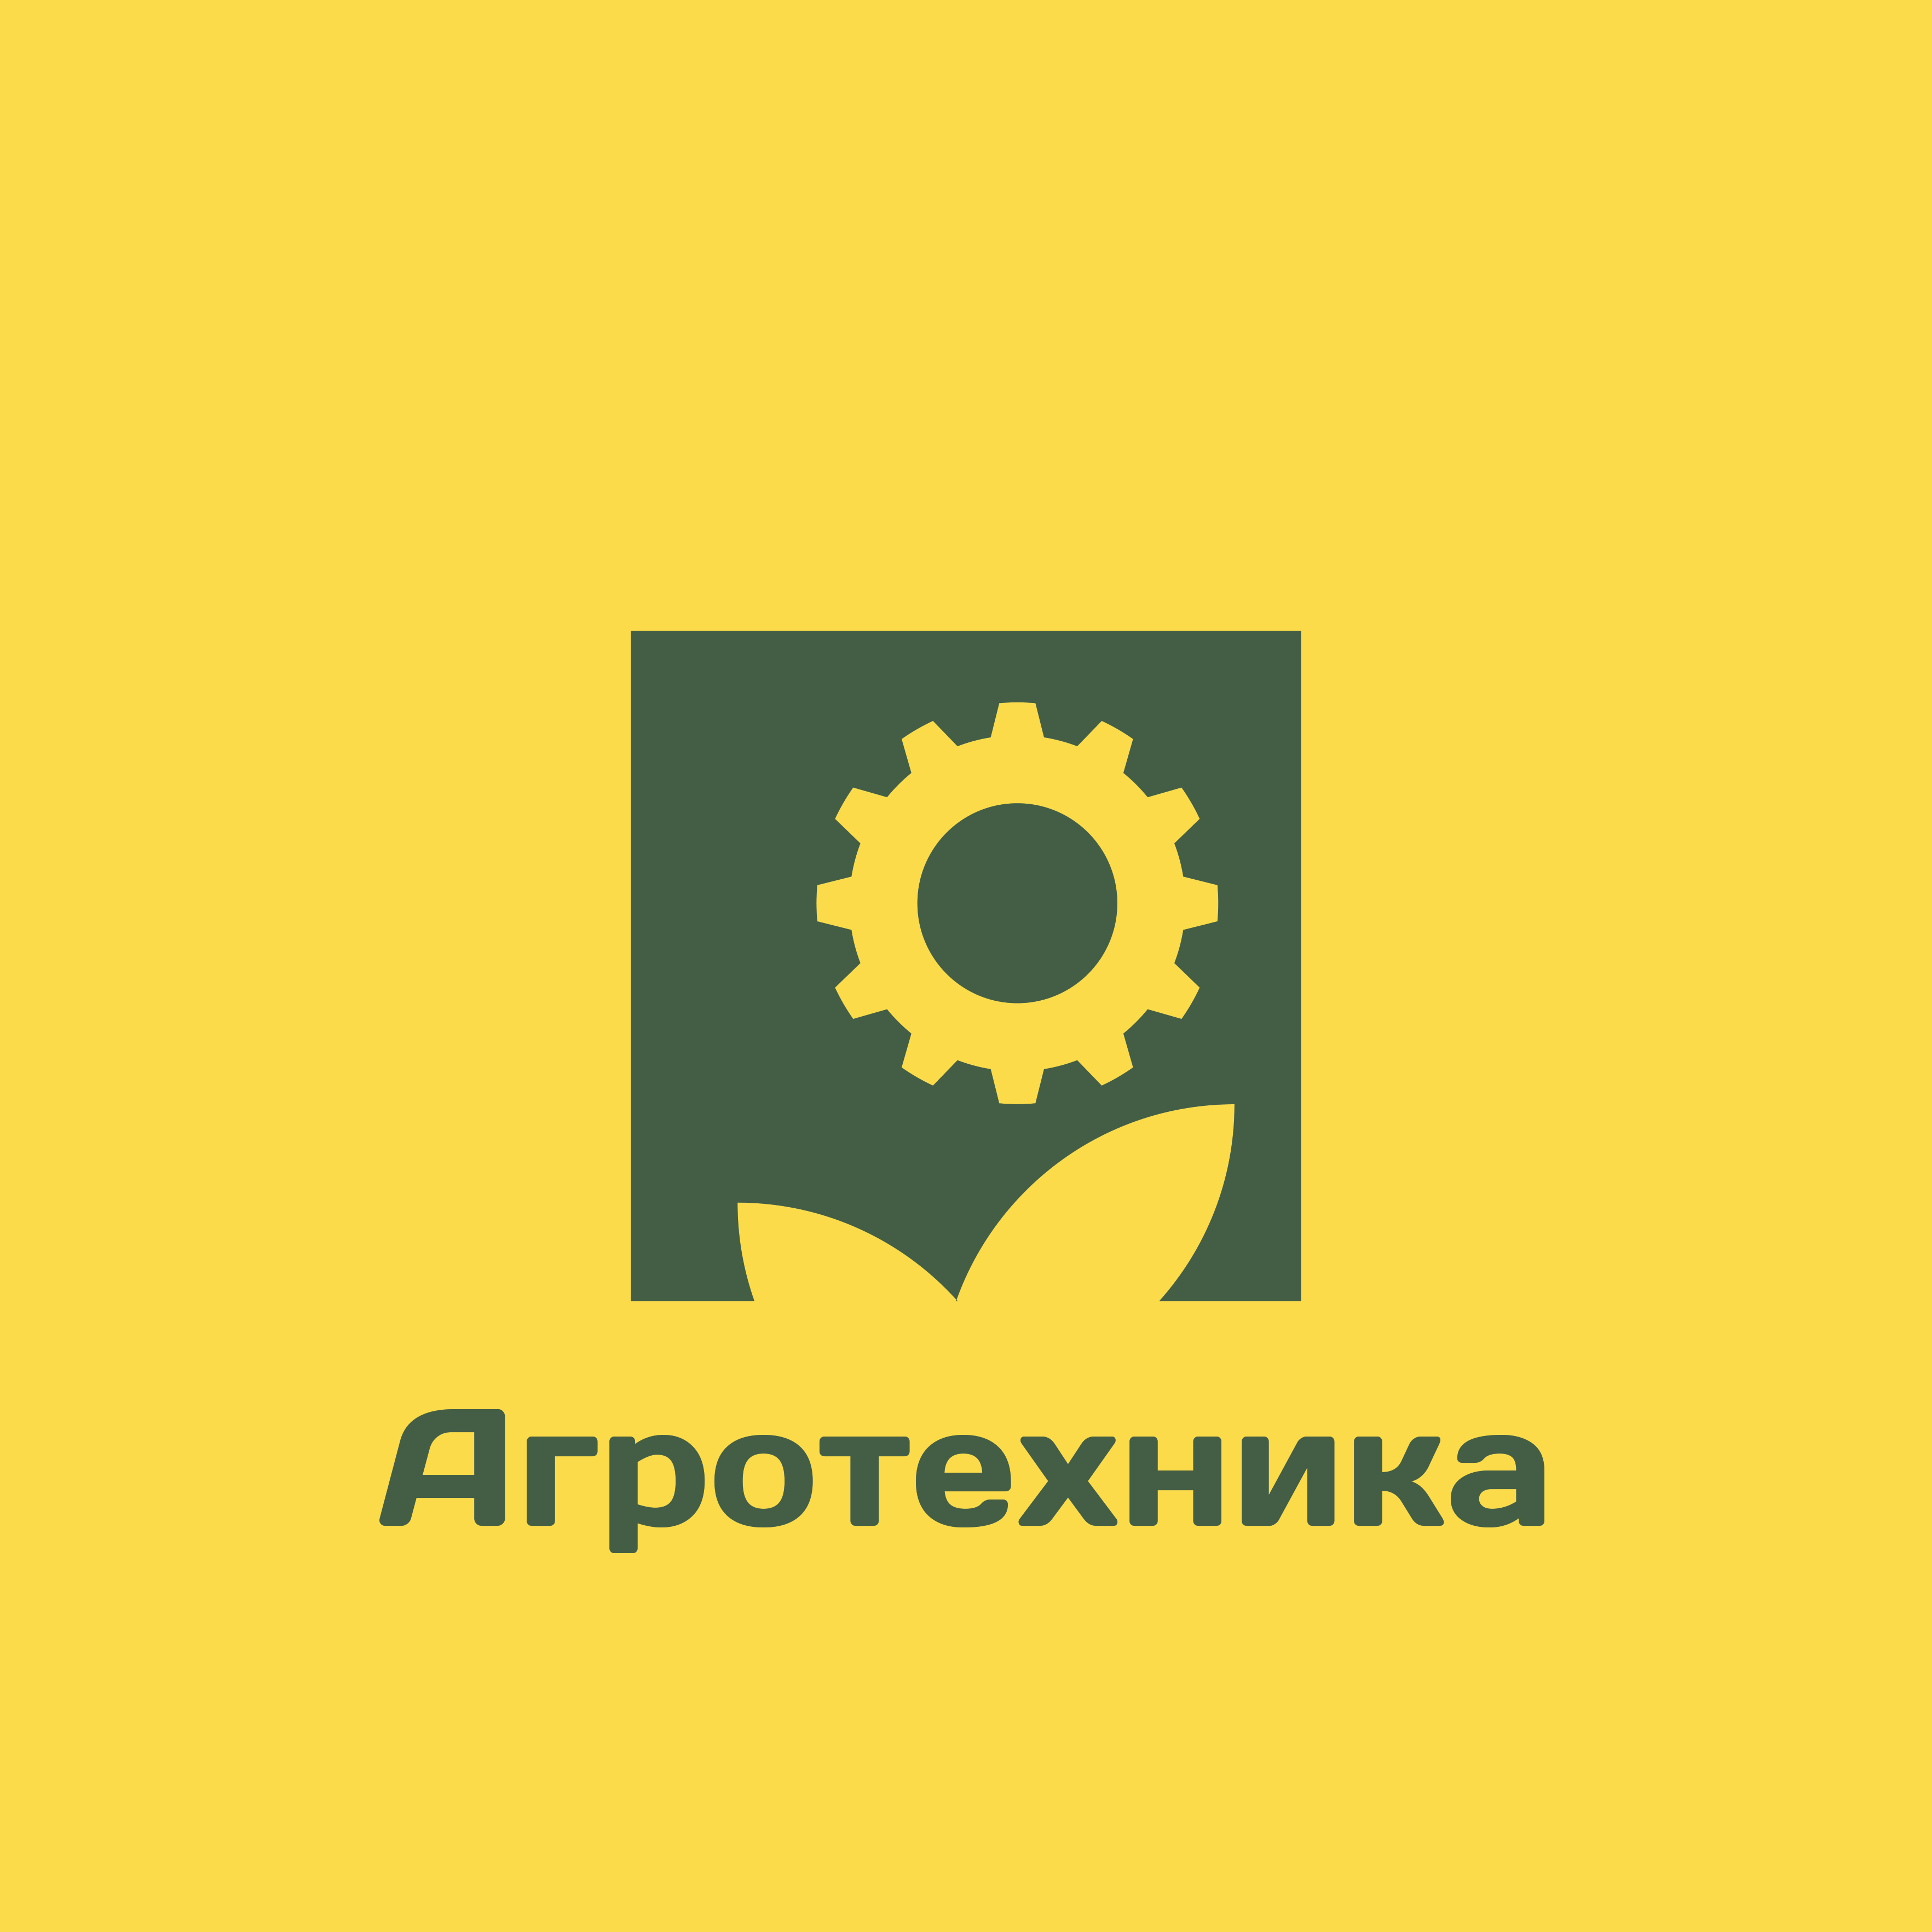 Разработка логотипа для компании Агротехника фото f_1085c08edadb5055.jpg